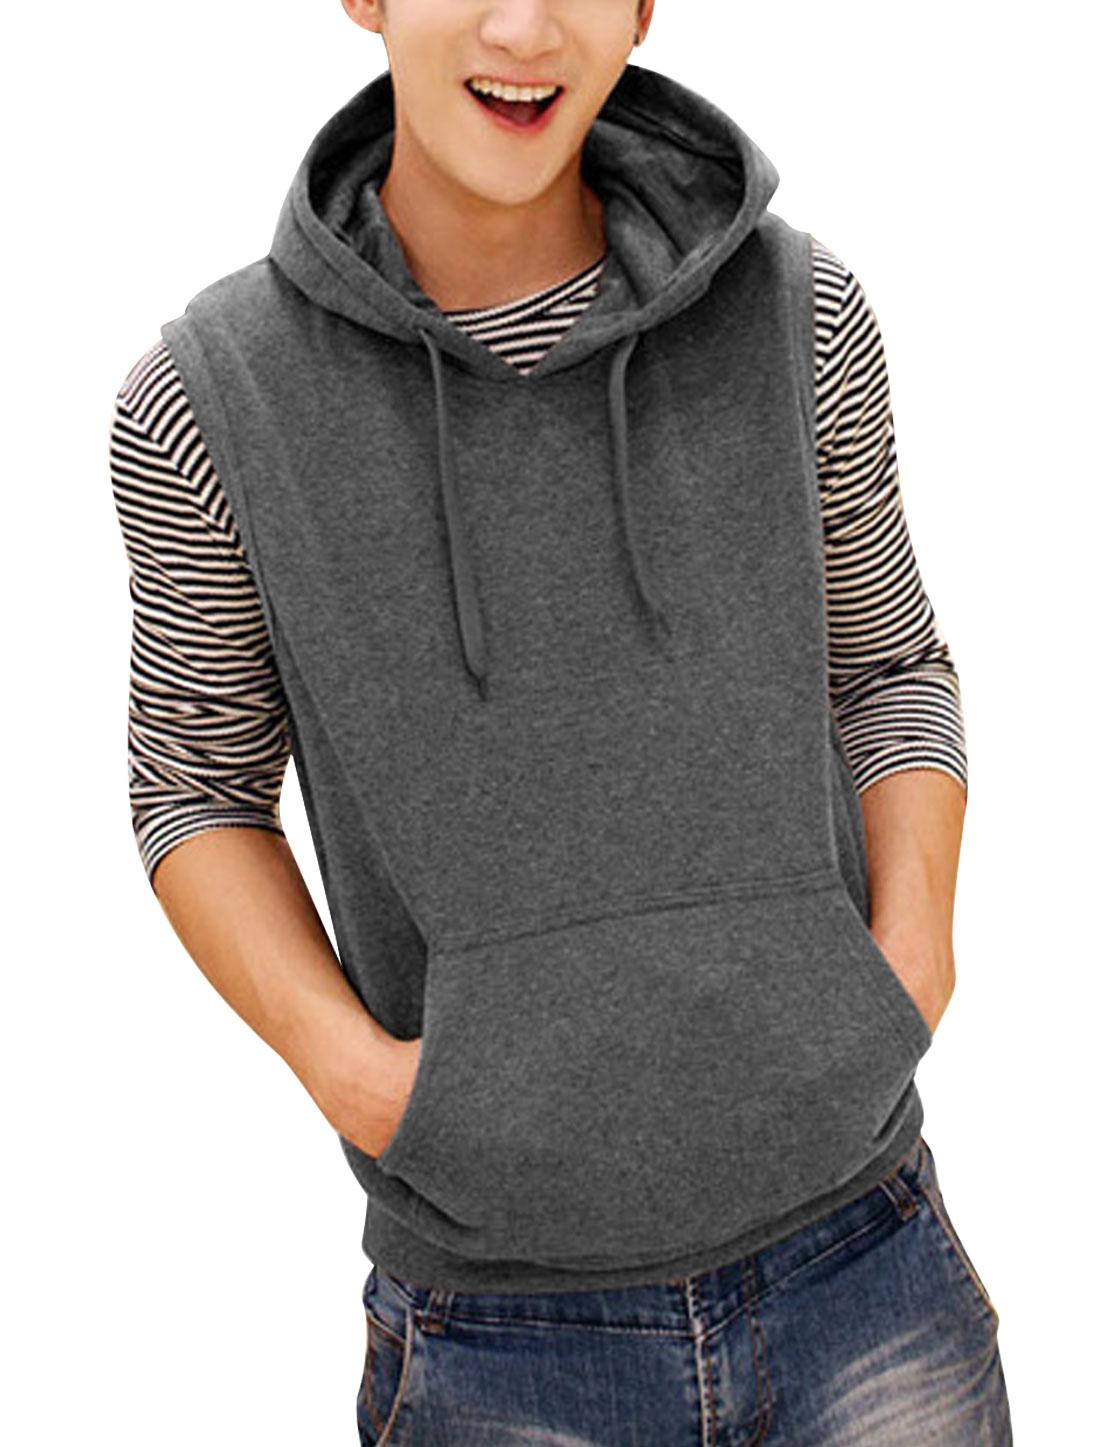 Men Drawstring Hood Sleeveless Kangaroo Pocket Casual Vest Dark Gray M